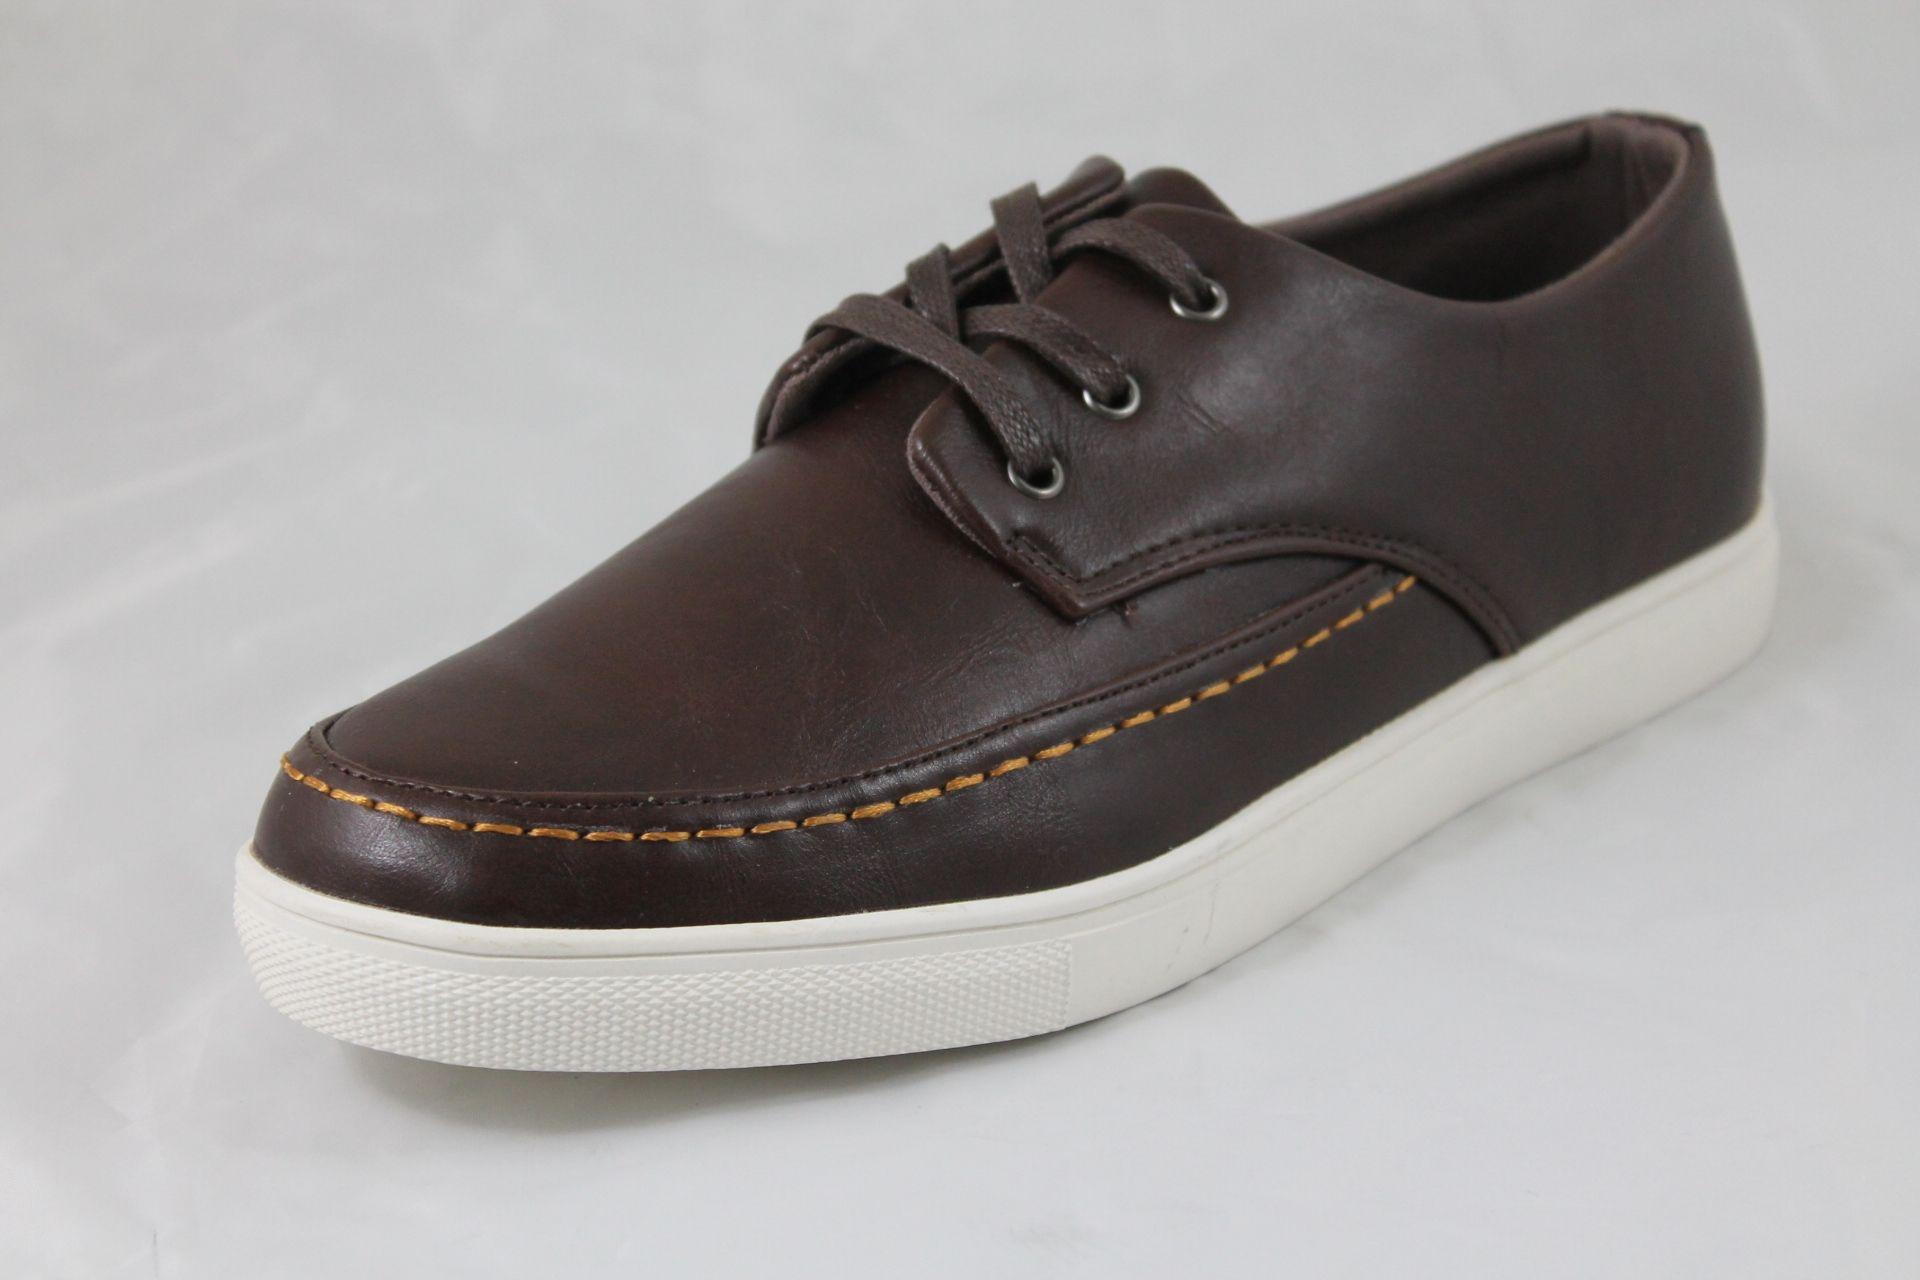 8597dad189b8a سعر Shoebox حذاء كاجوال - بني فى مصر